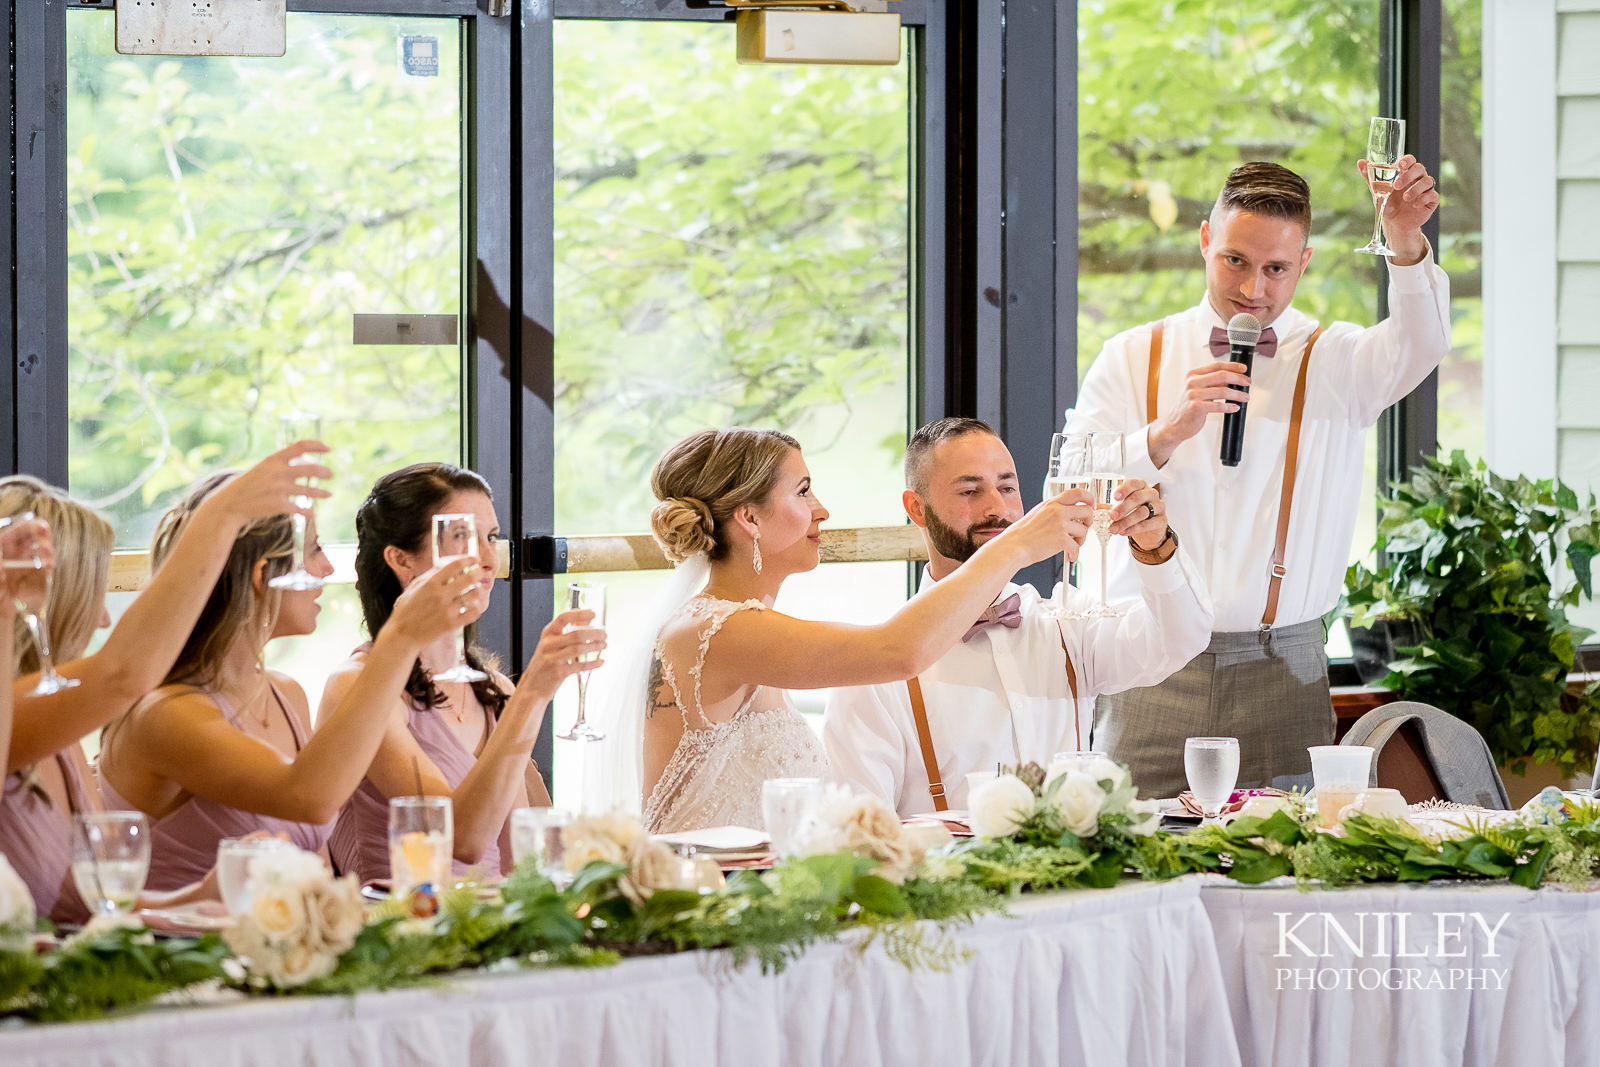 082 - Ontario Golf Club Wedding Pictures - XT2B8931.jpg